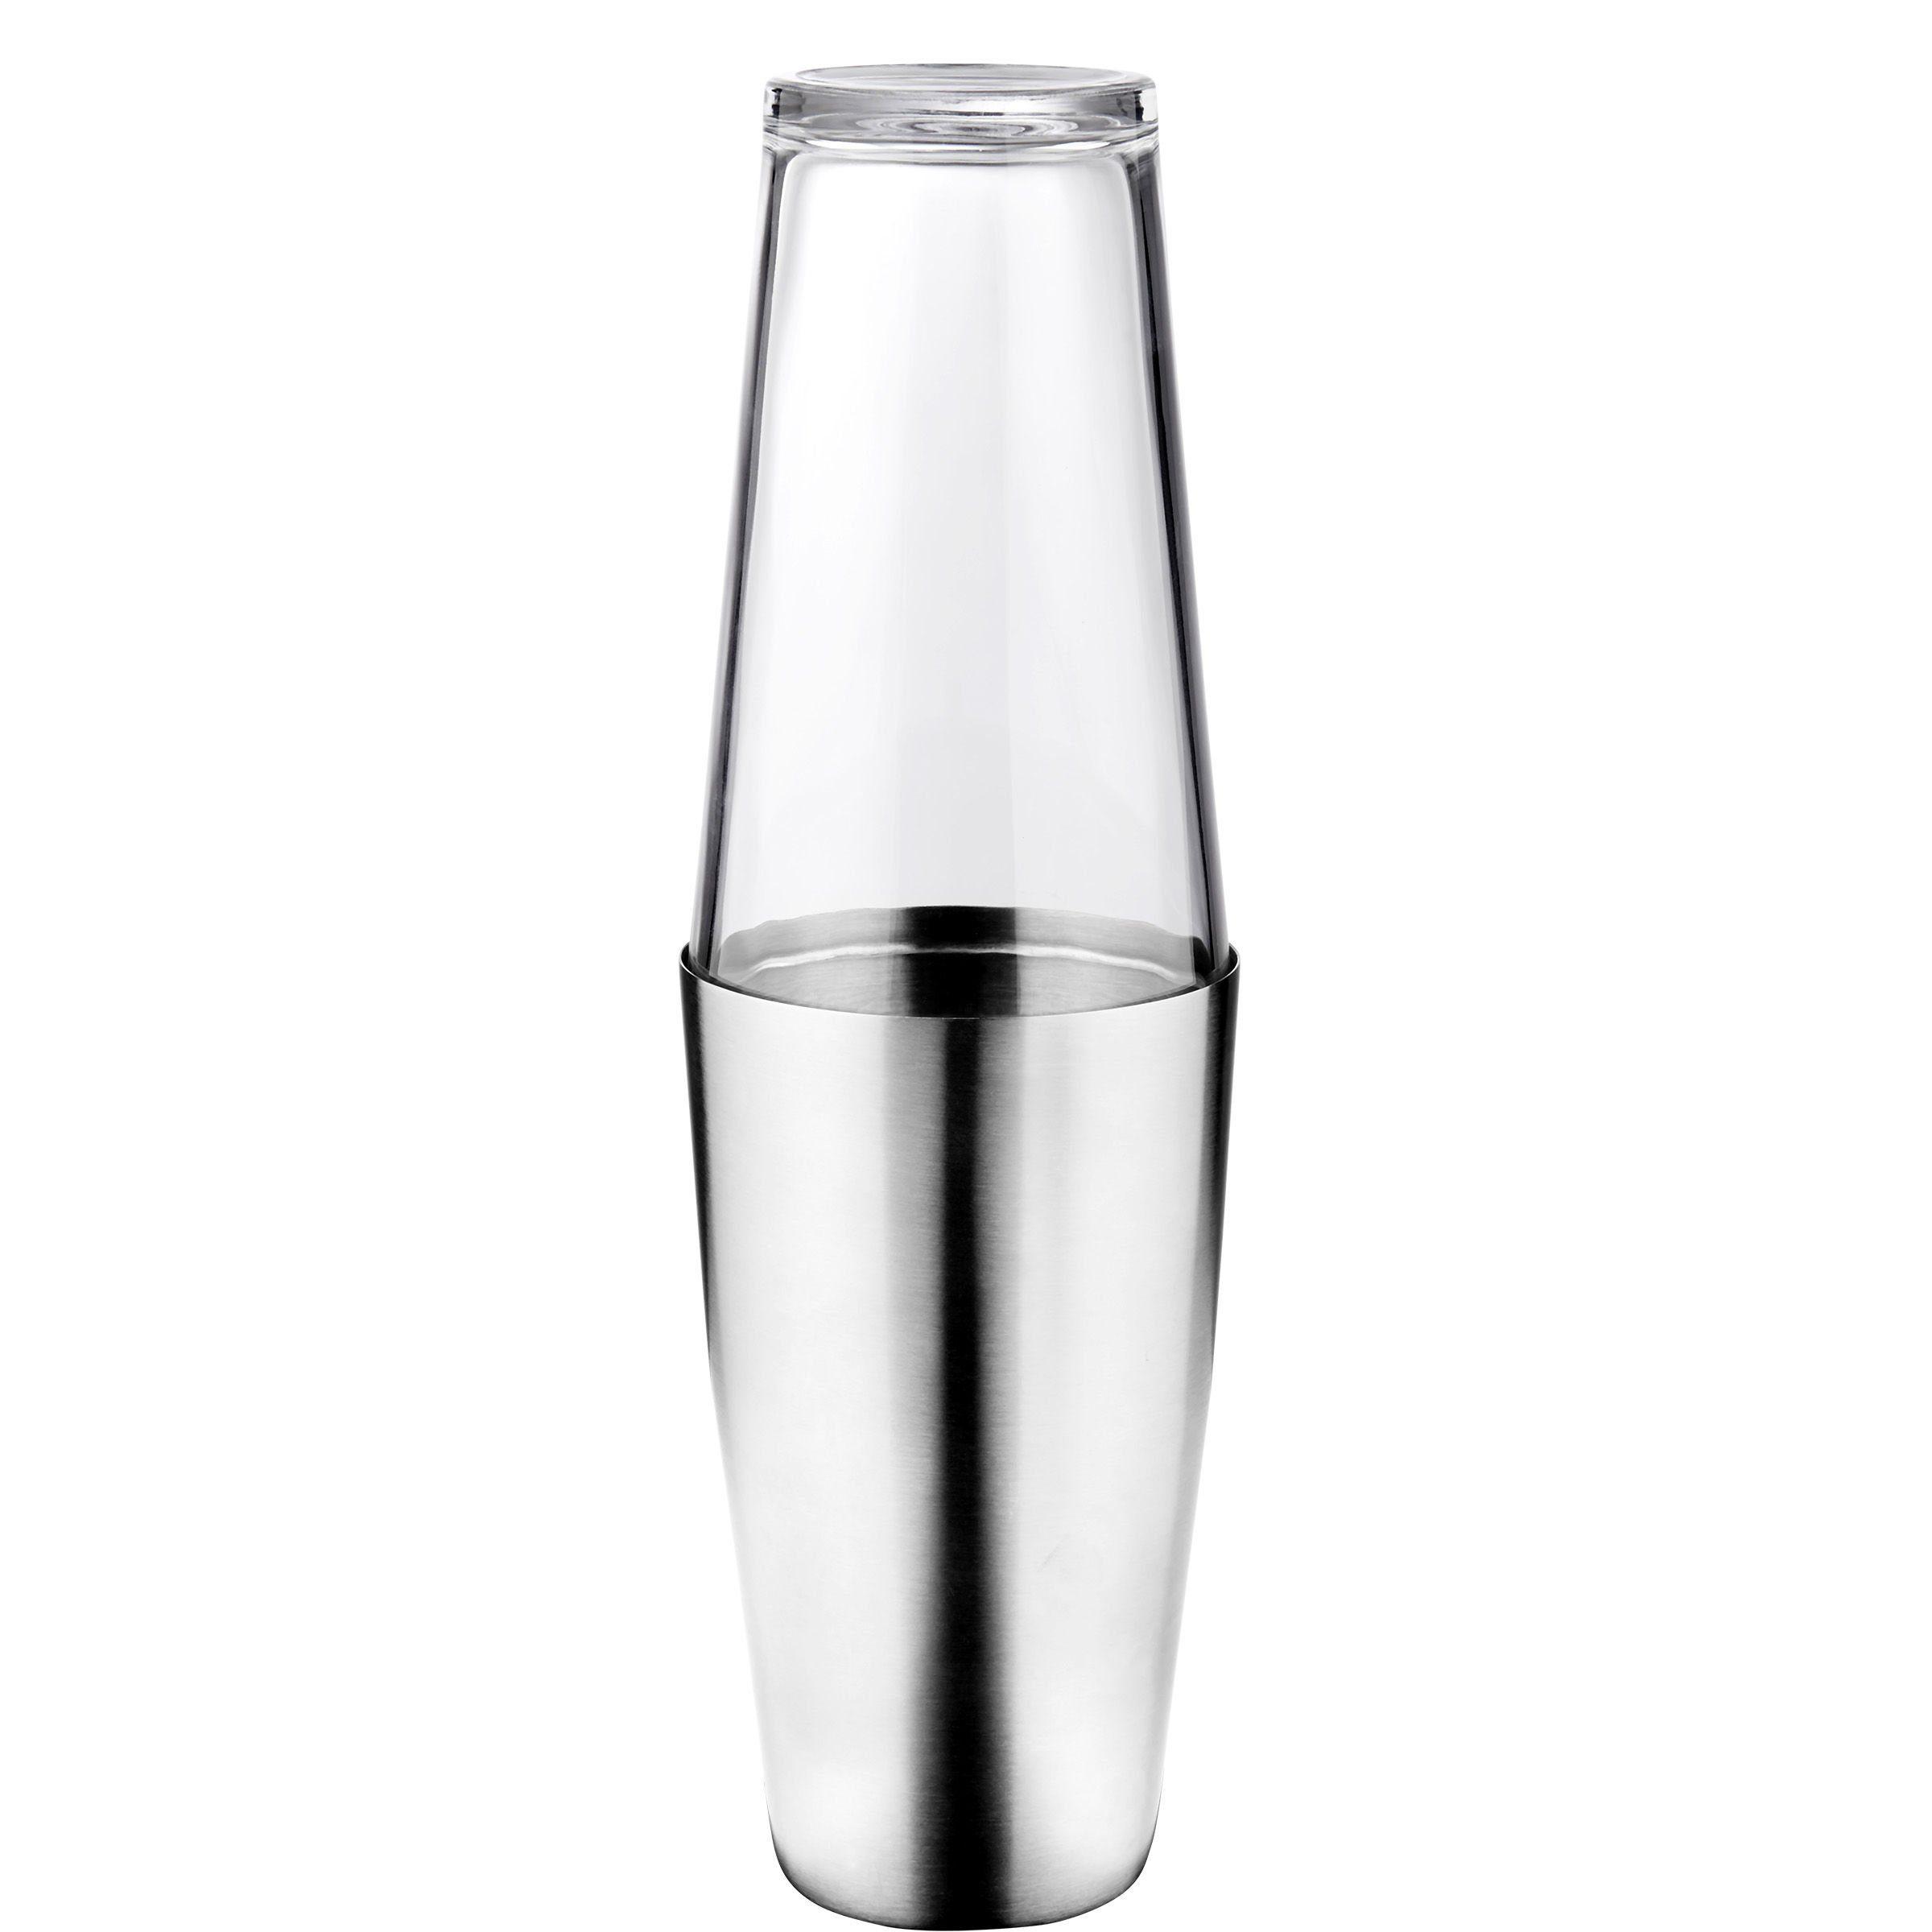 BUTLERS COSMOPOLITAN »Cocktailshaker mit Glas«